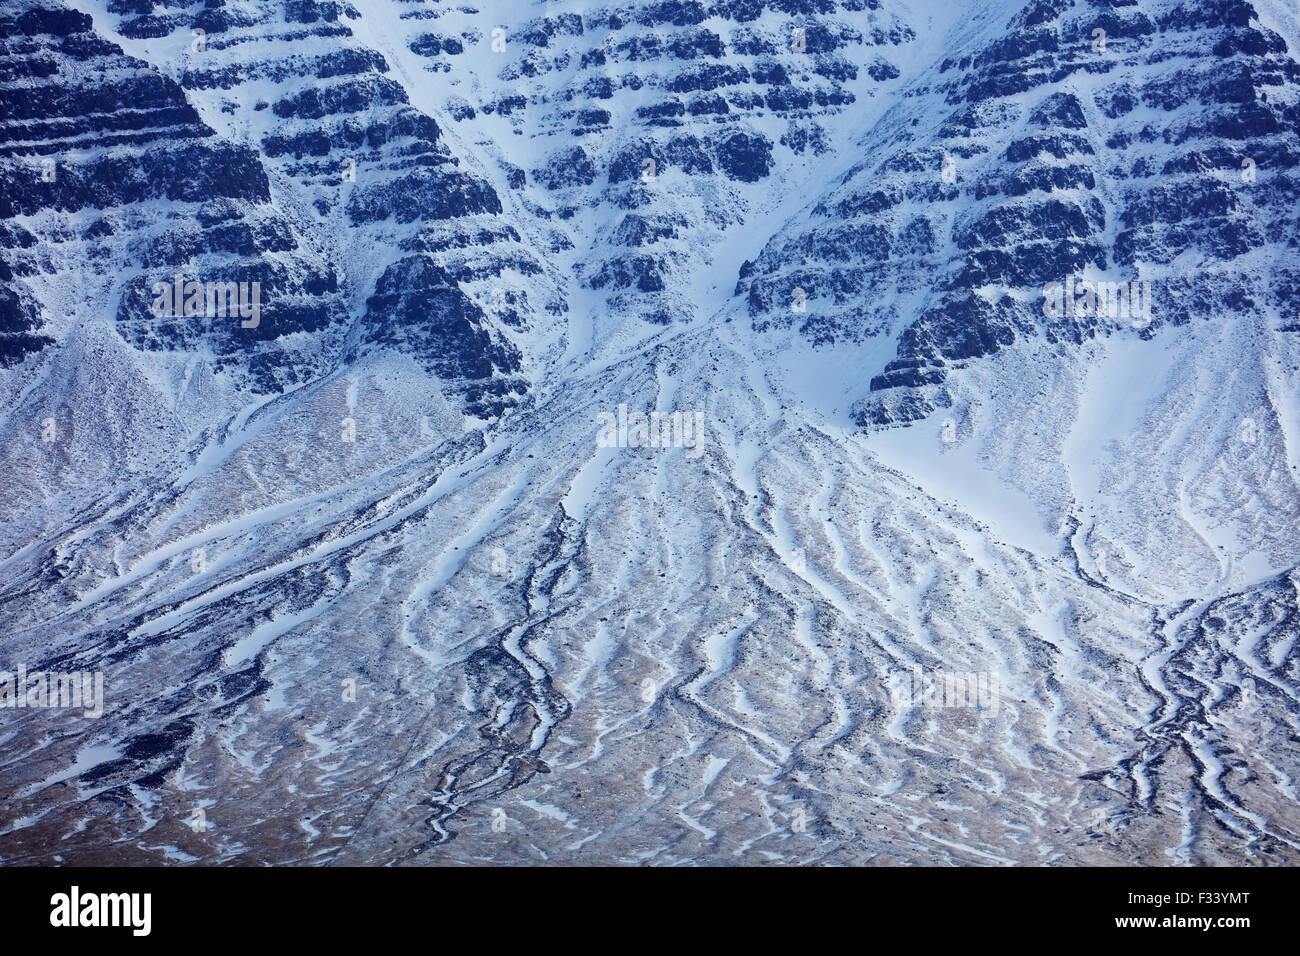 snowclad Hafursfell, Snaefellsness Peninsula, Iceland - Stock Image